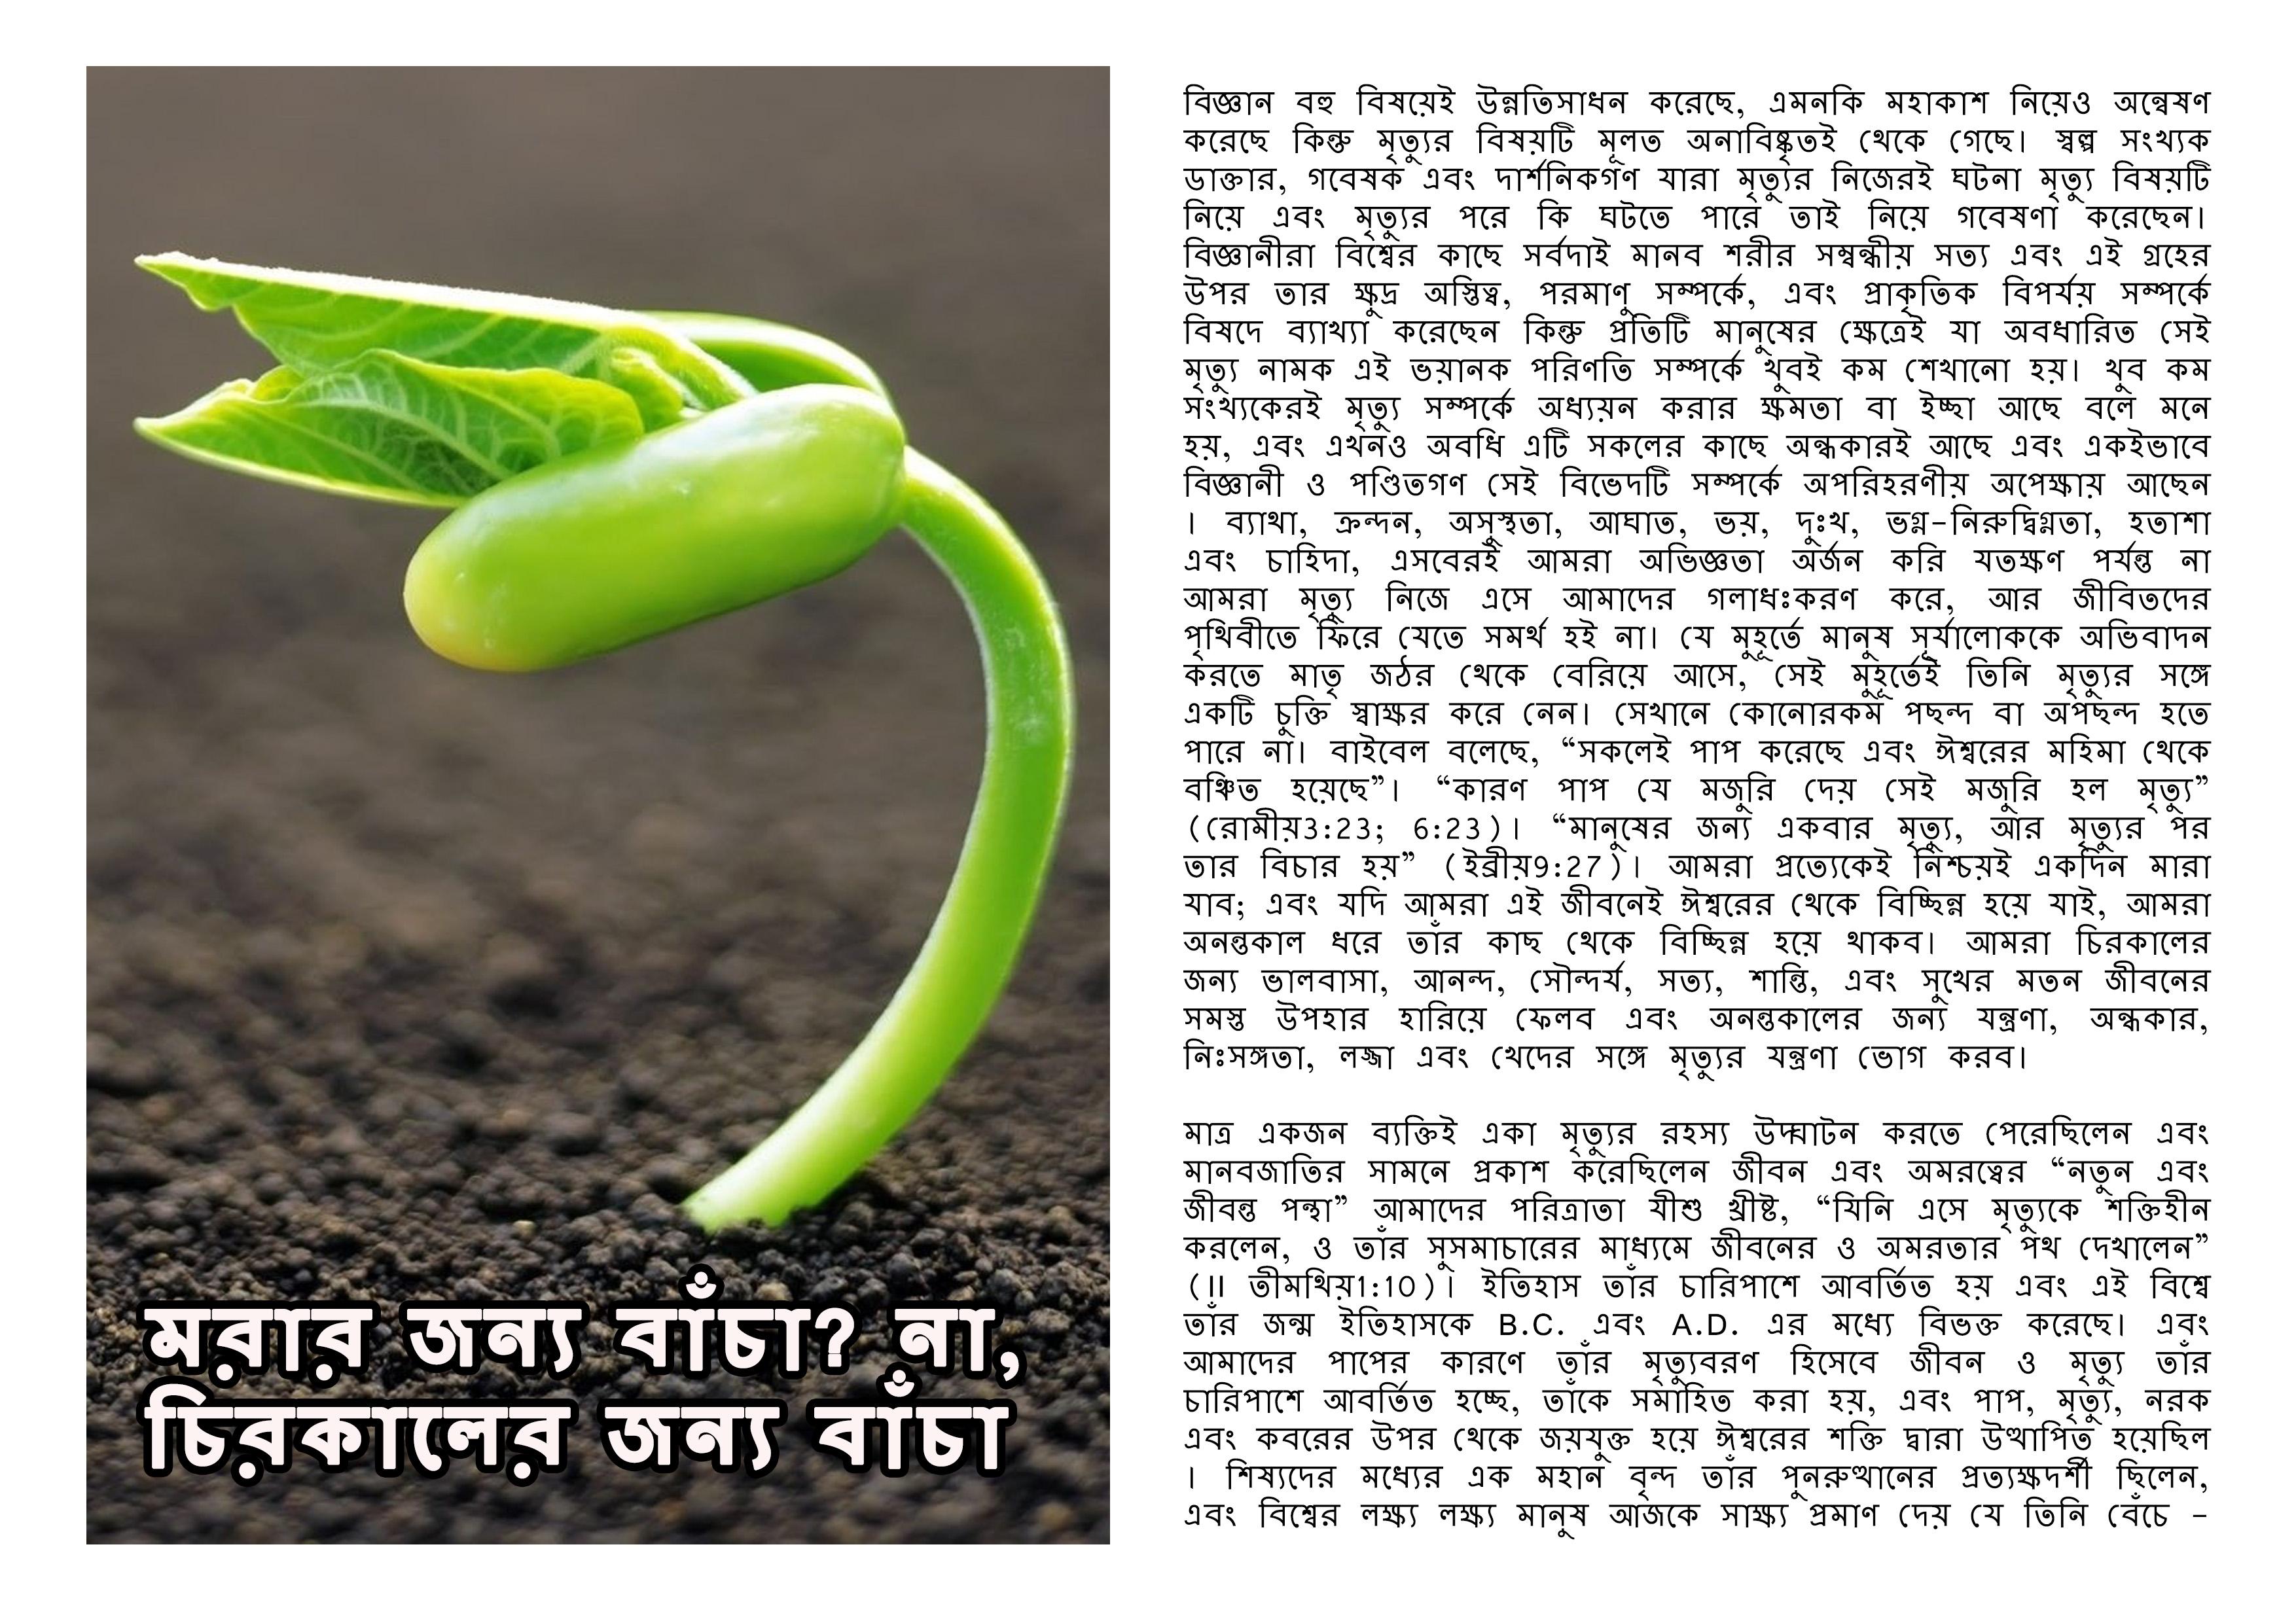 Live to die bengali